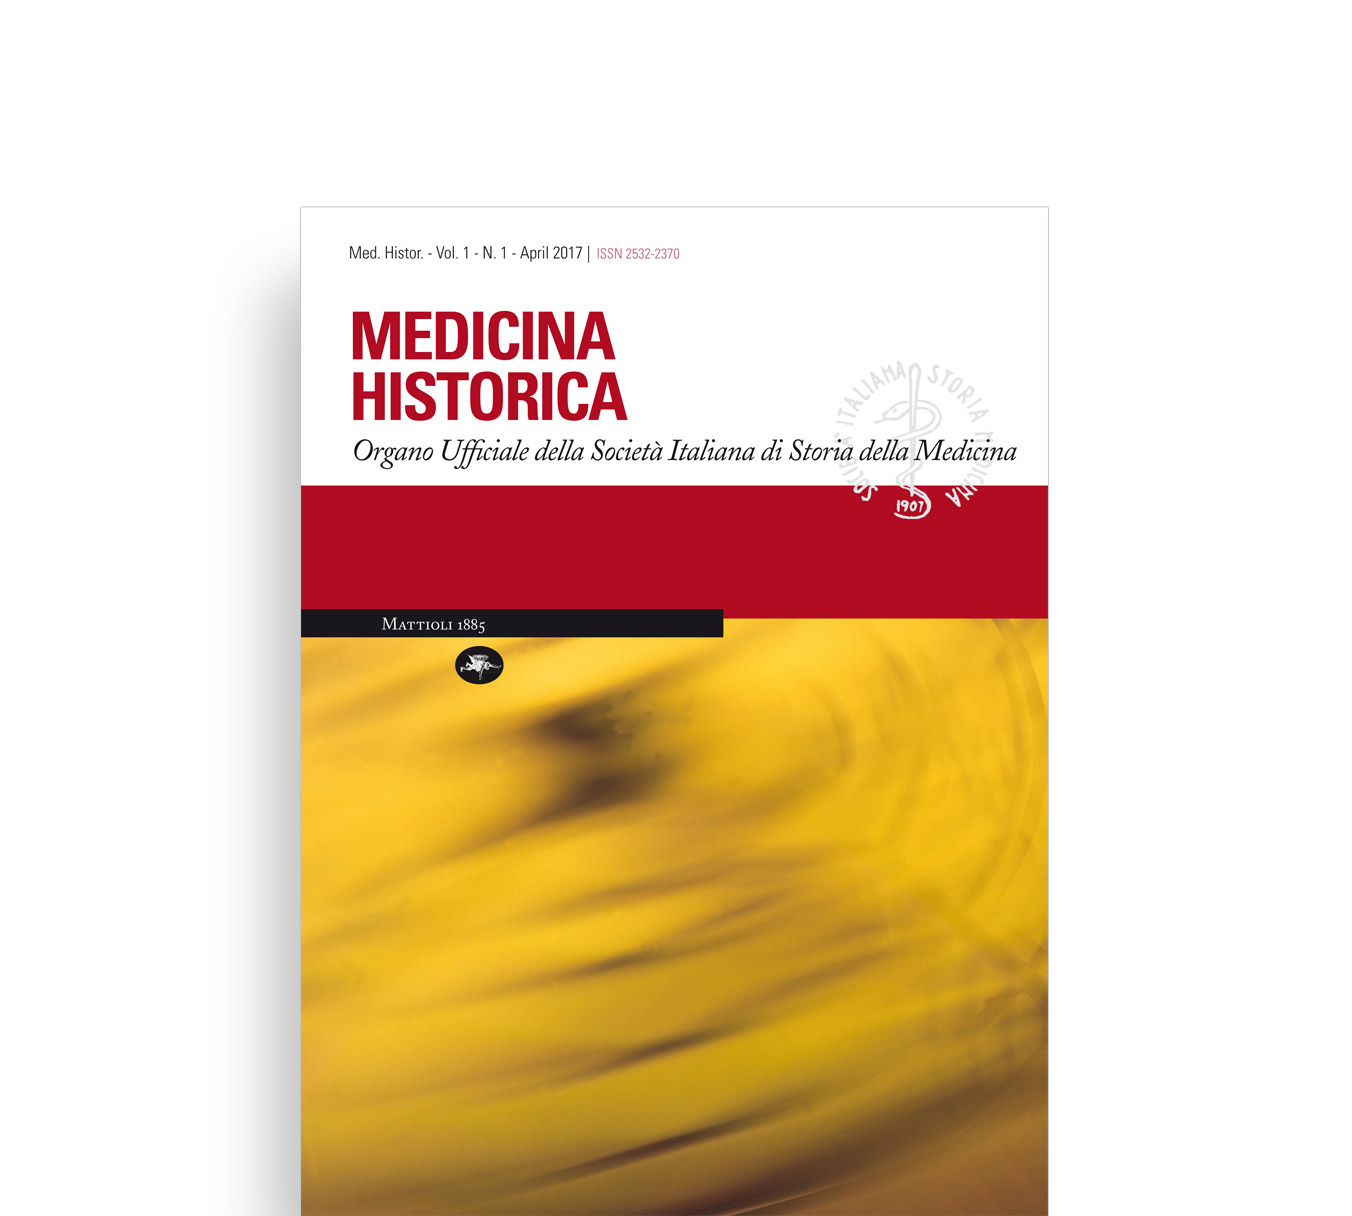 Medicina-Historica-home